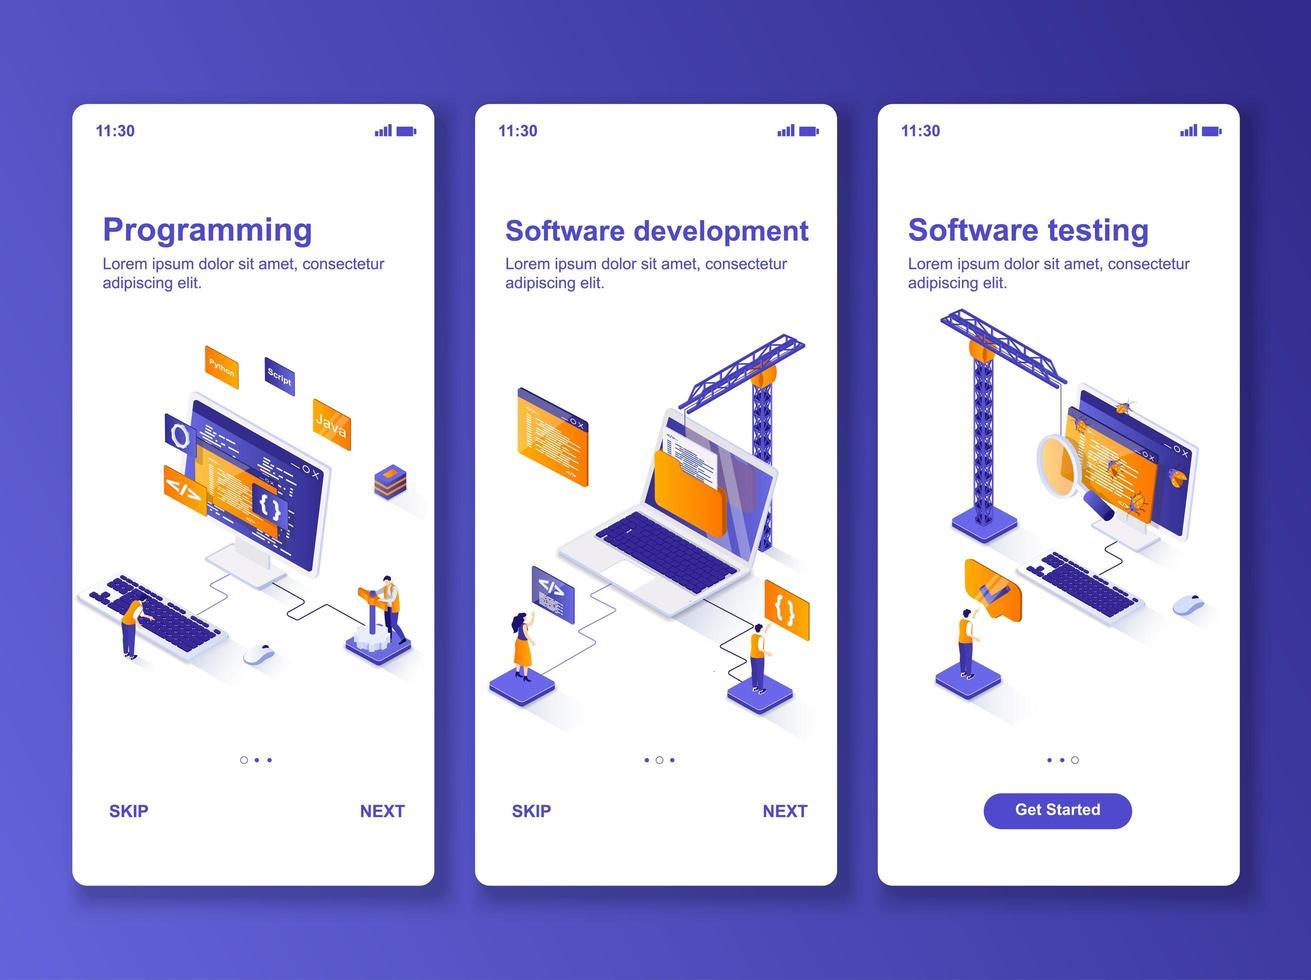 mjukvaruutveckling isometrisk gui design kit. vektor